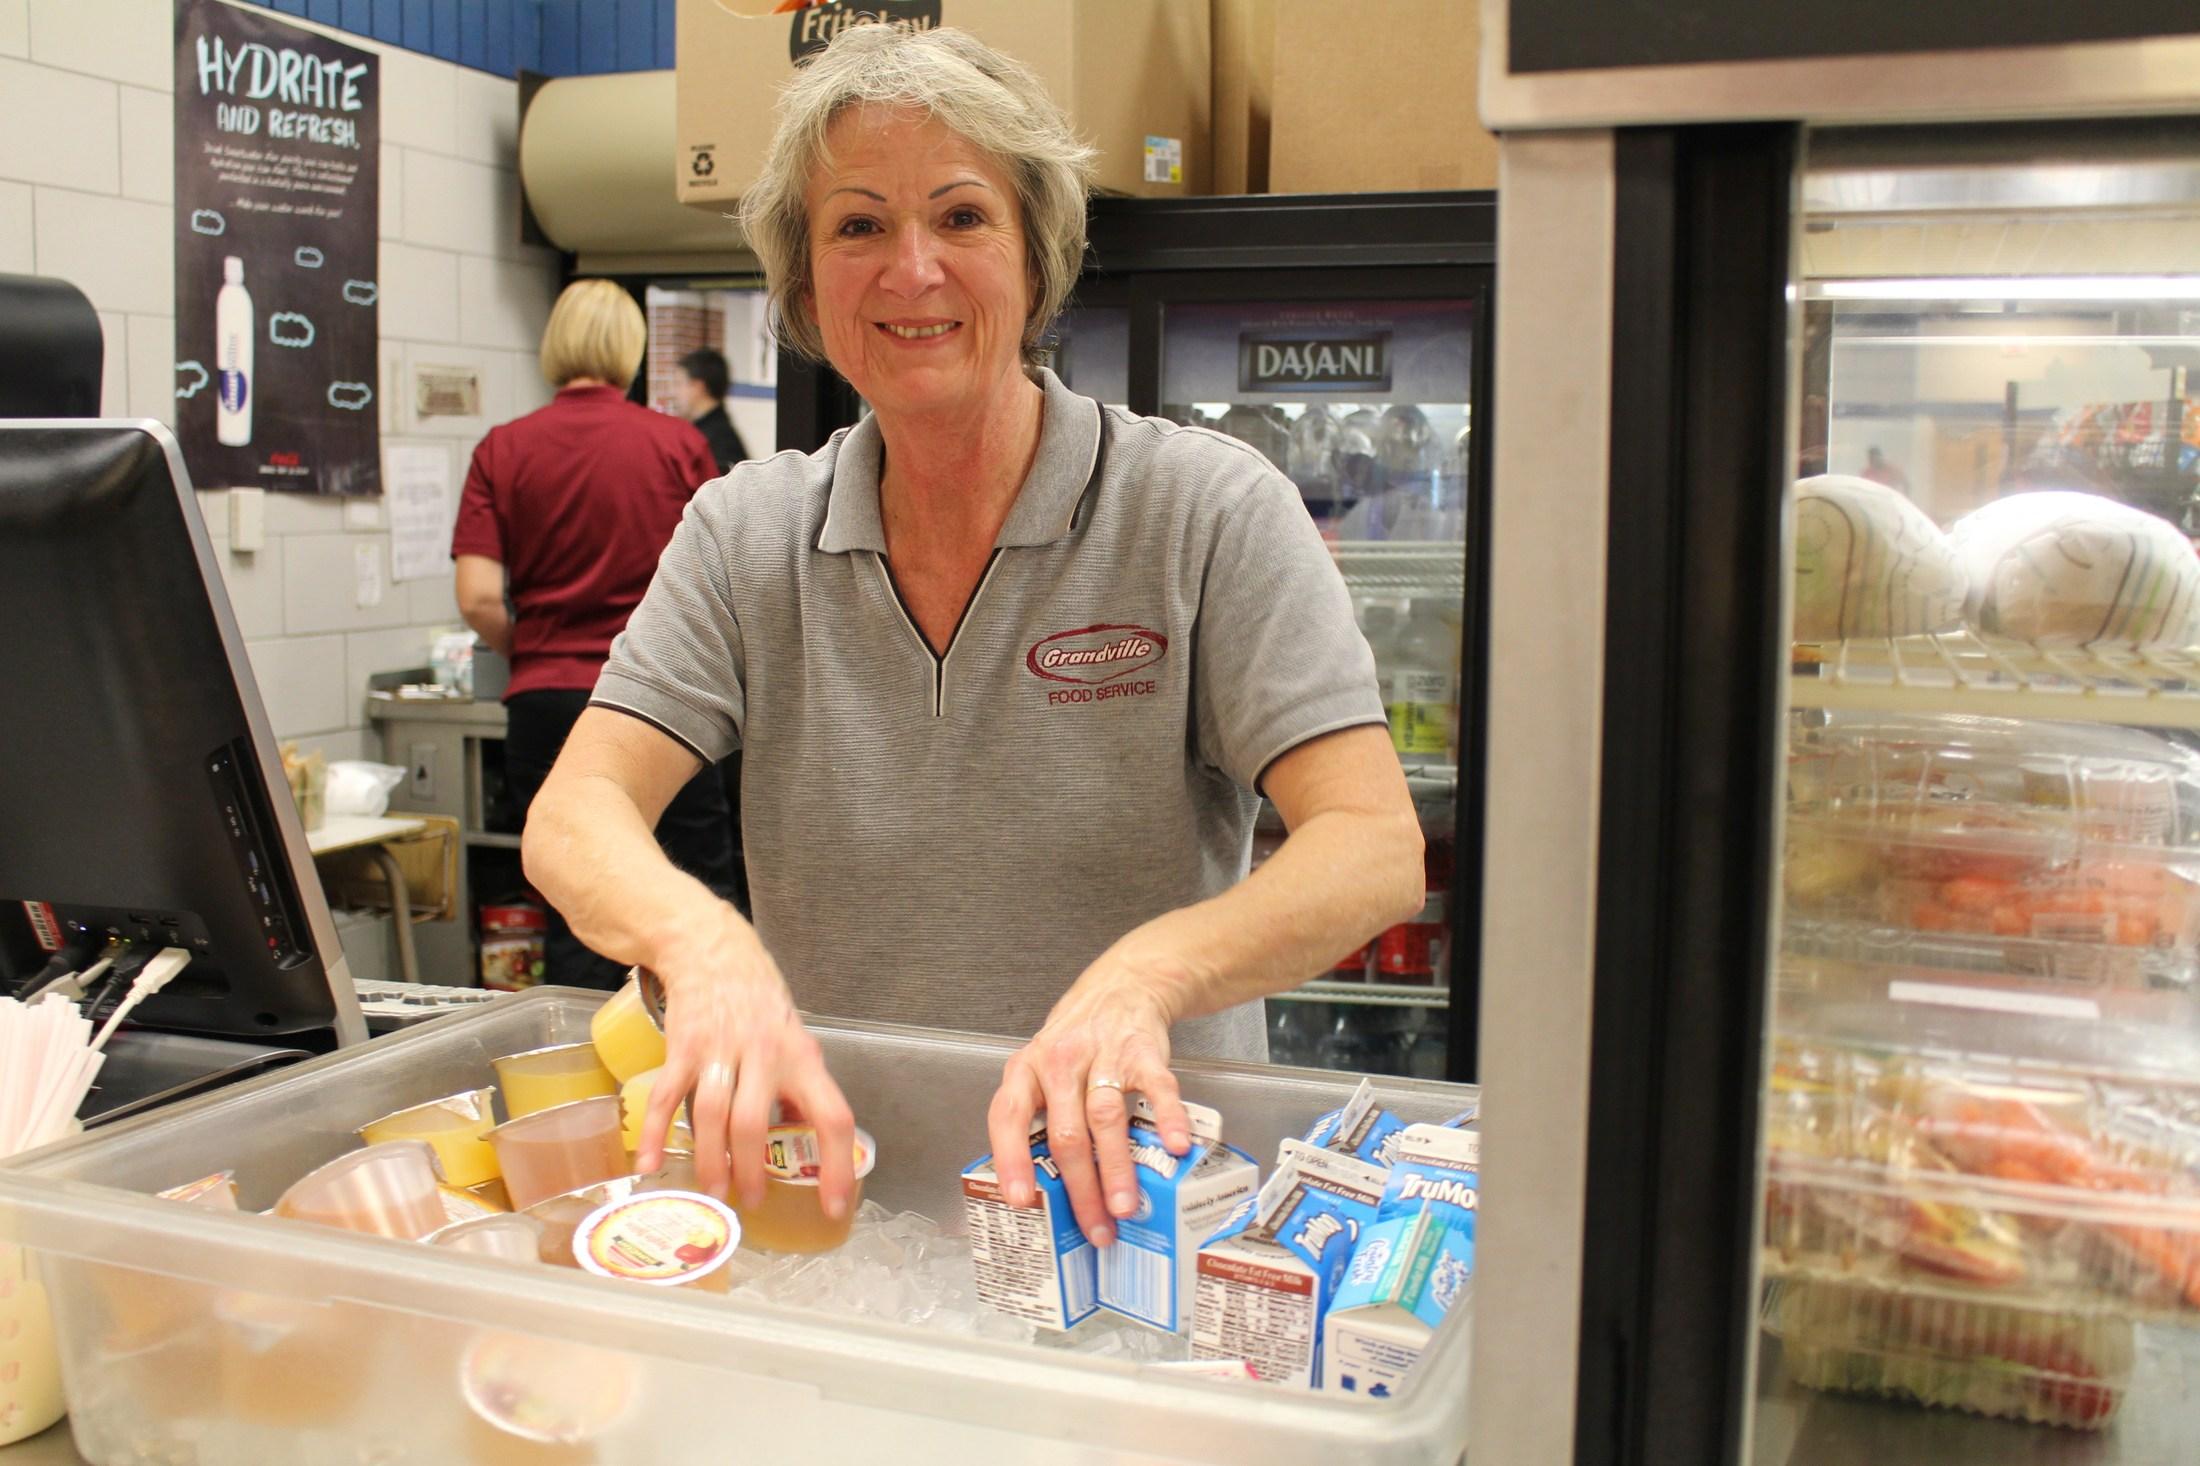 food service staff